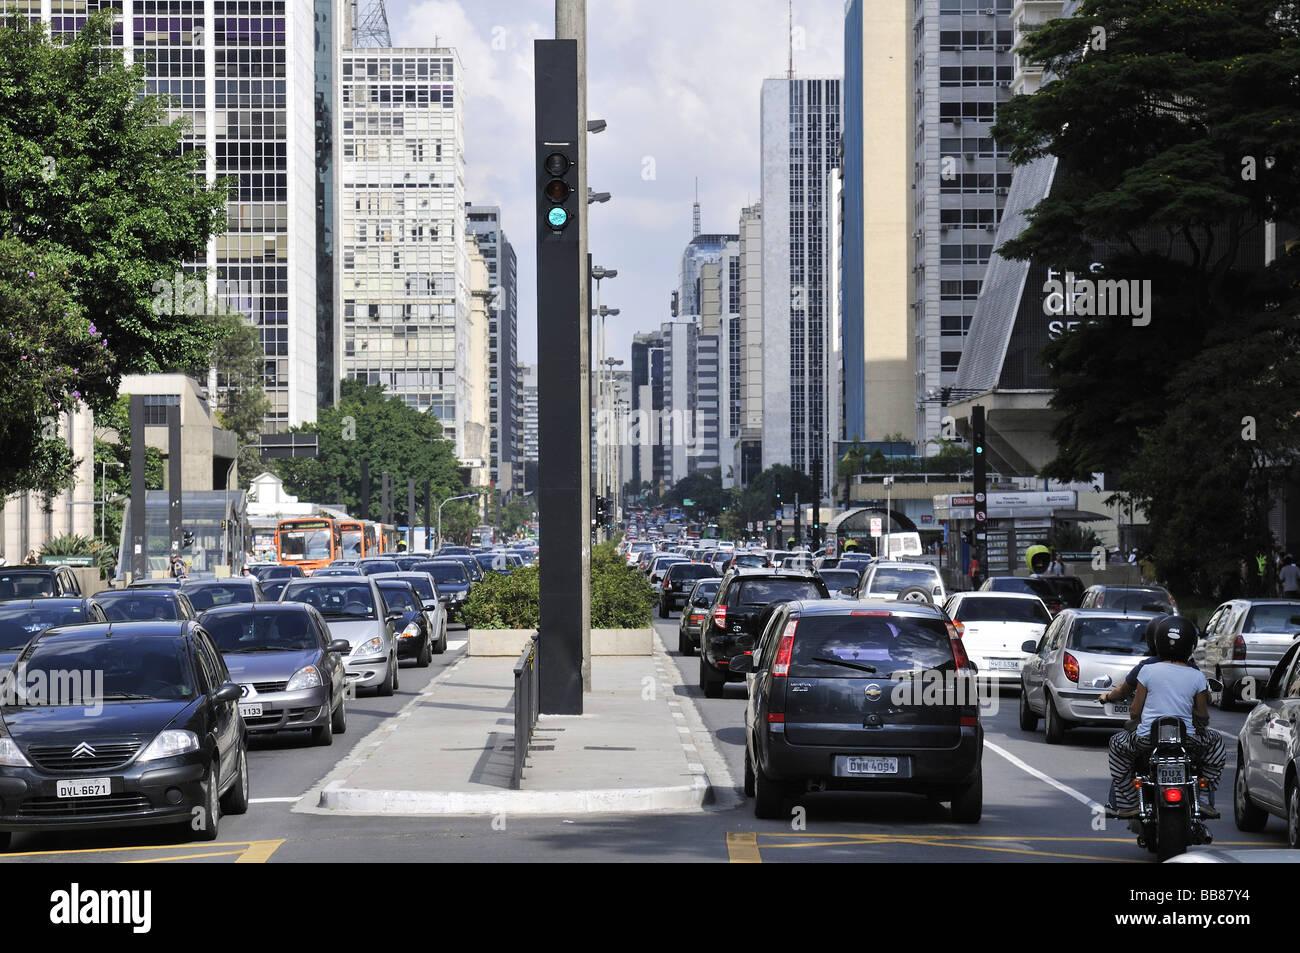 La circulation dans la rue Avenida Paulista, Sao Paulo, Brésil, Amérique du Sud Photo Stock